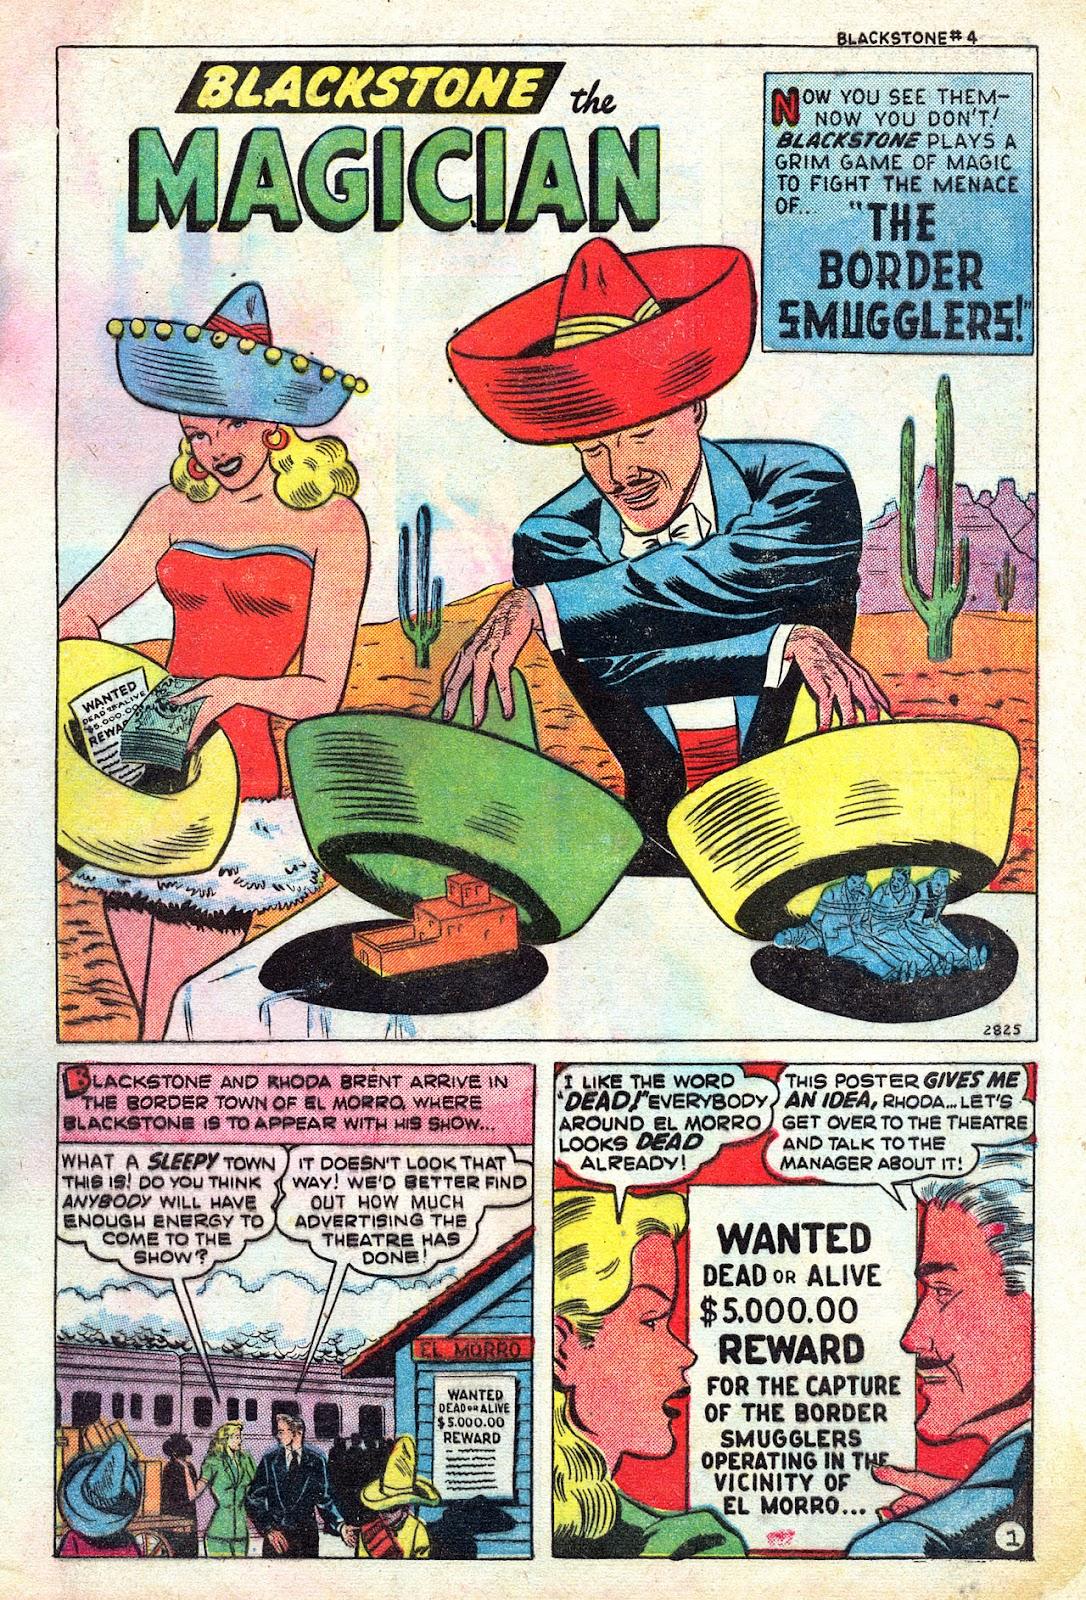 Read online Blackstone the Magician comic -  Issue #4 - 3